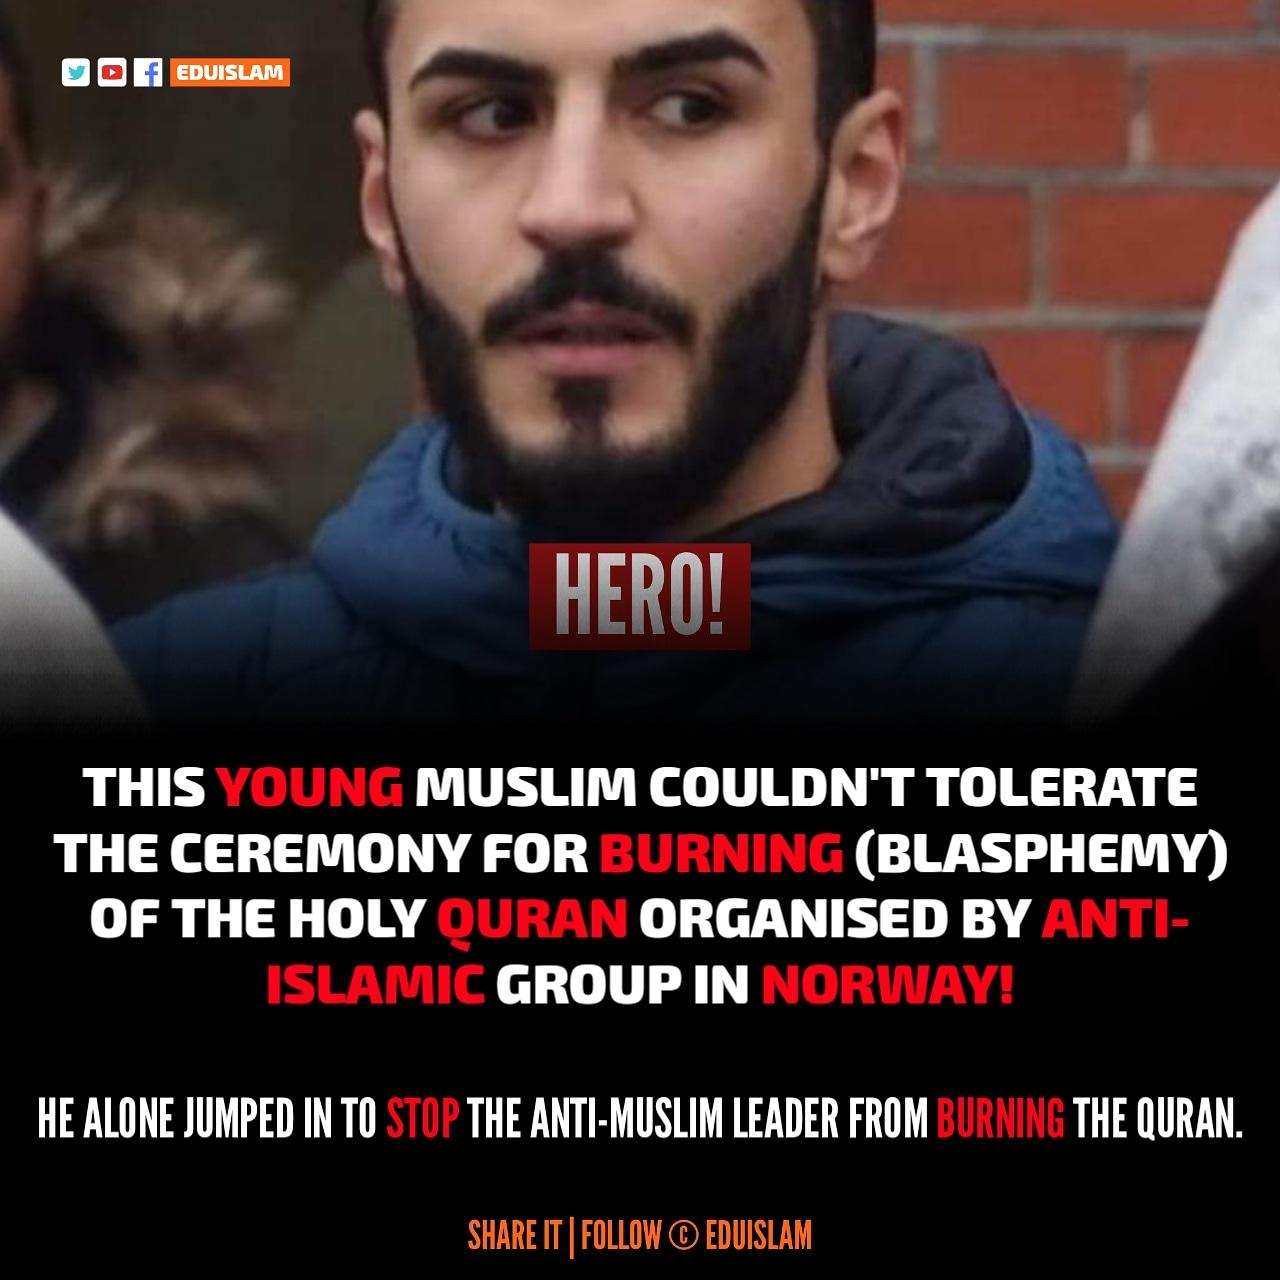 Defender of Quran, Young Muslim Stop Burning Of Quran in Norway